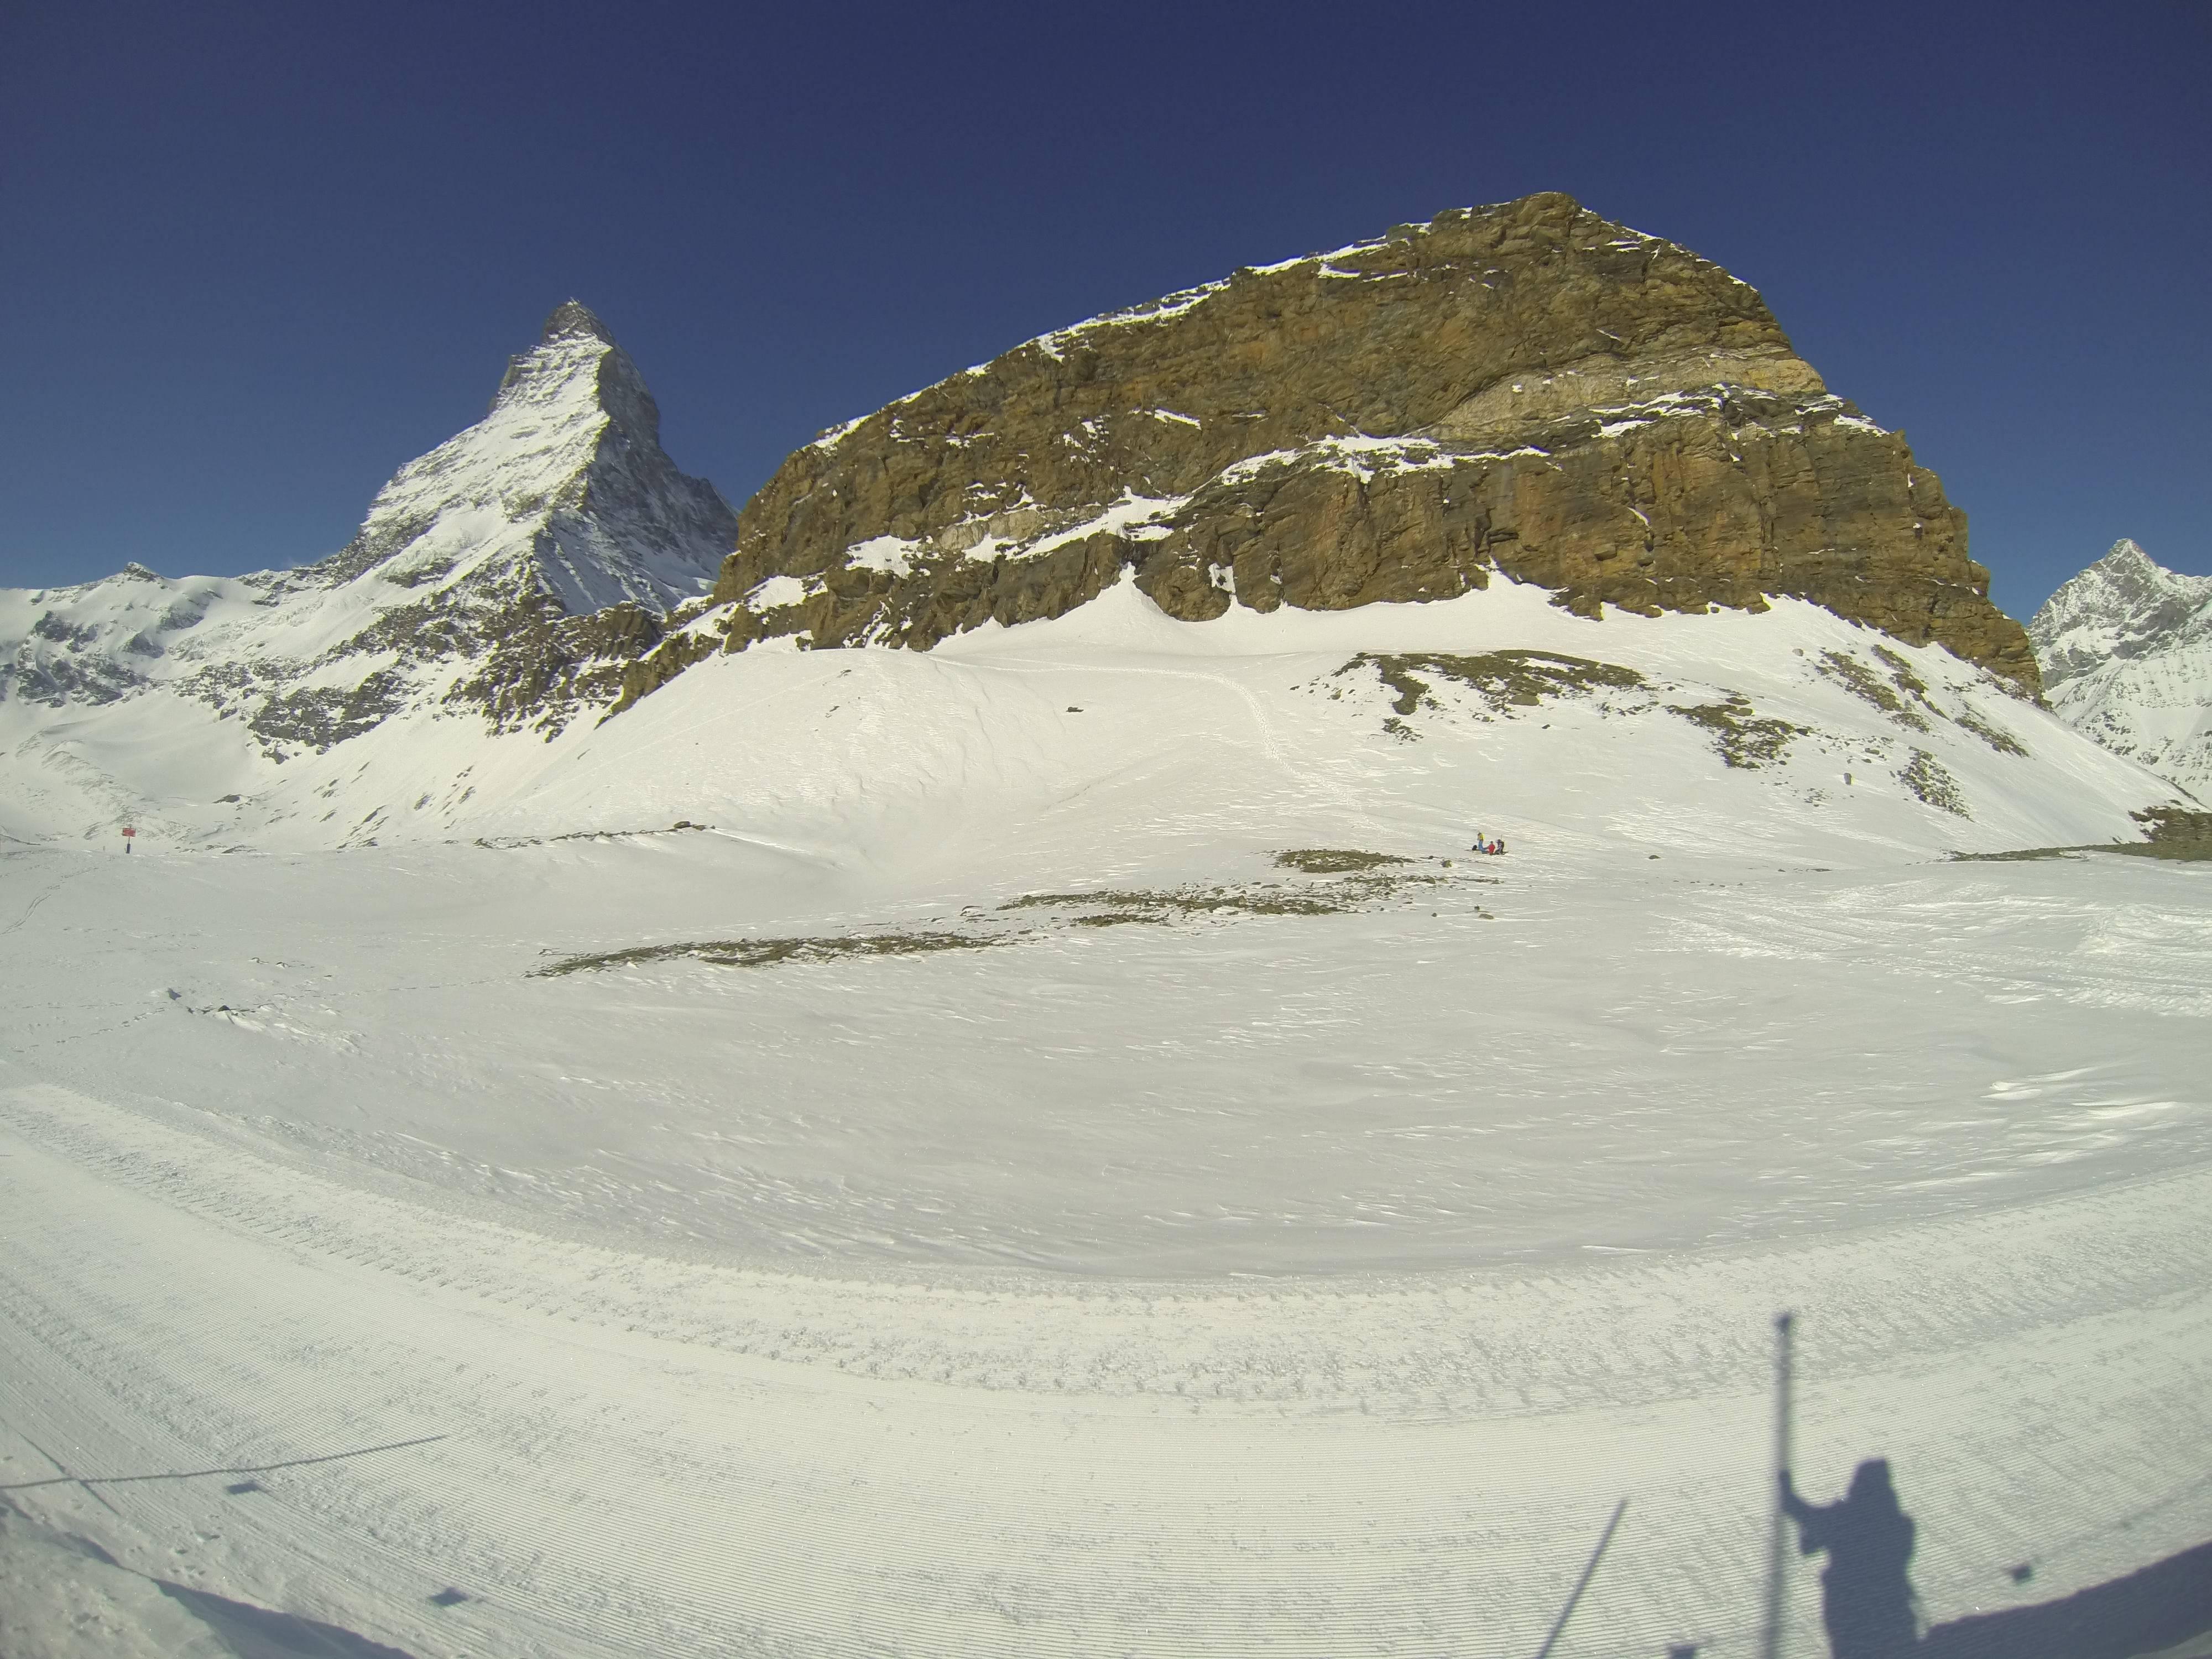 Photo 2: Zermatt : vue sur la montagne de Toblerone !